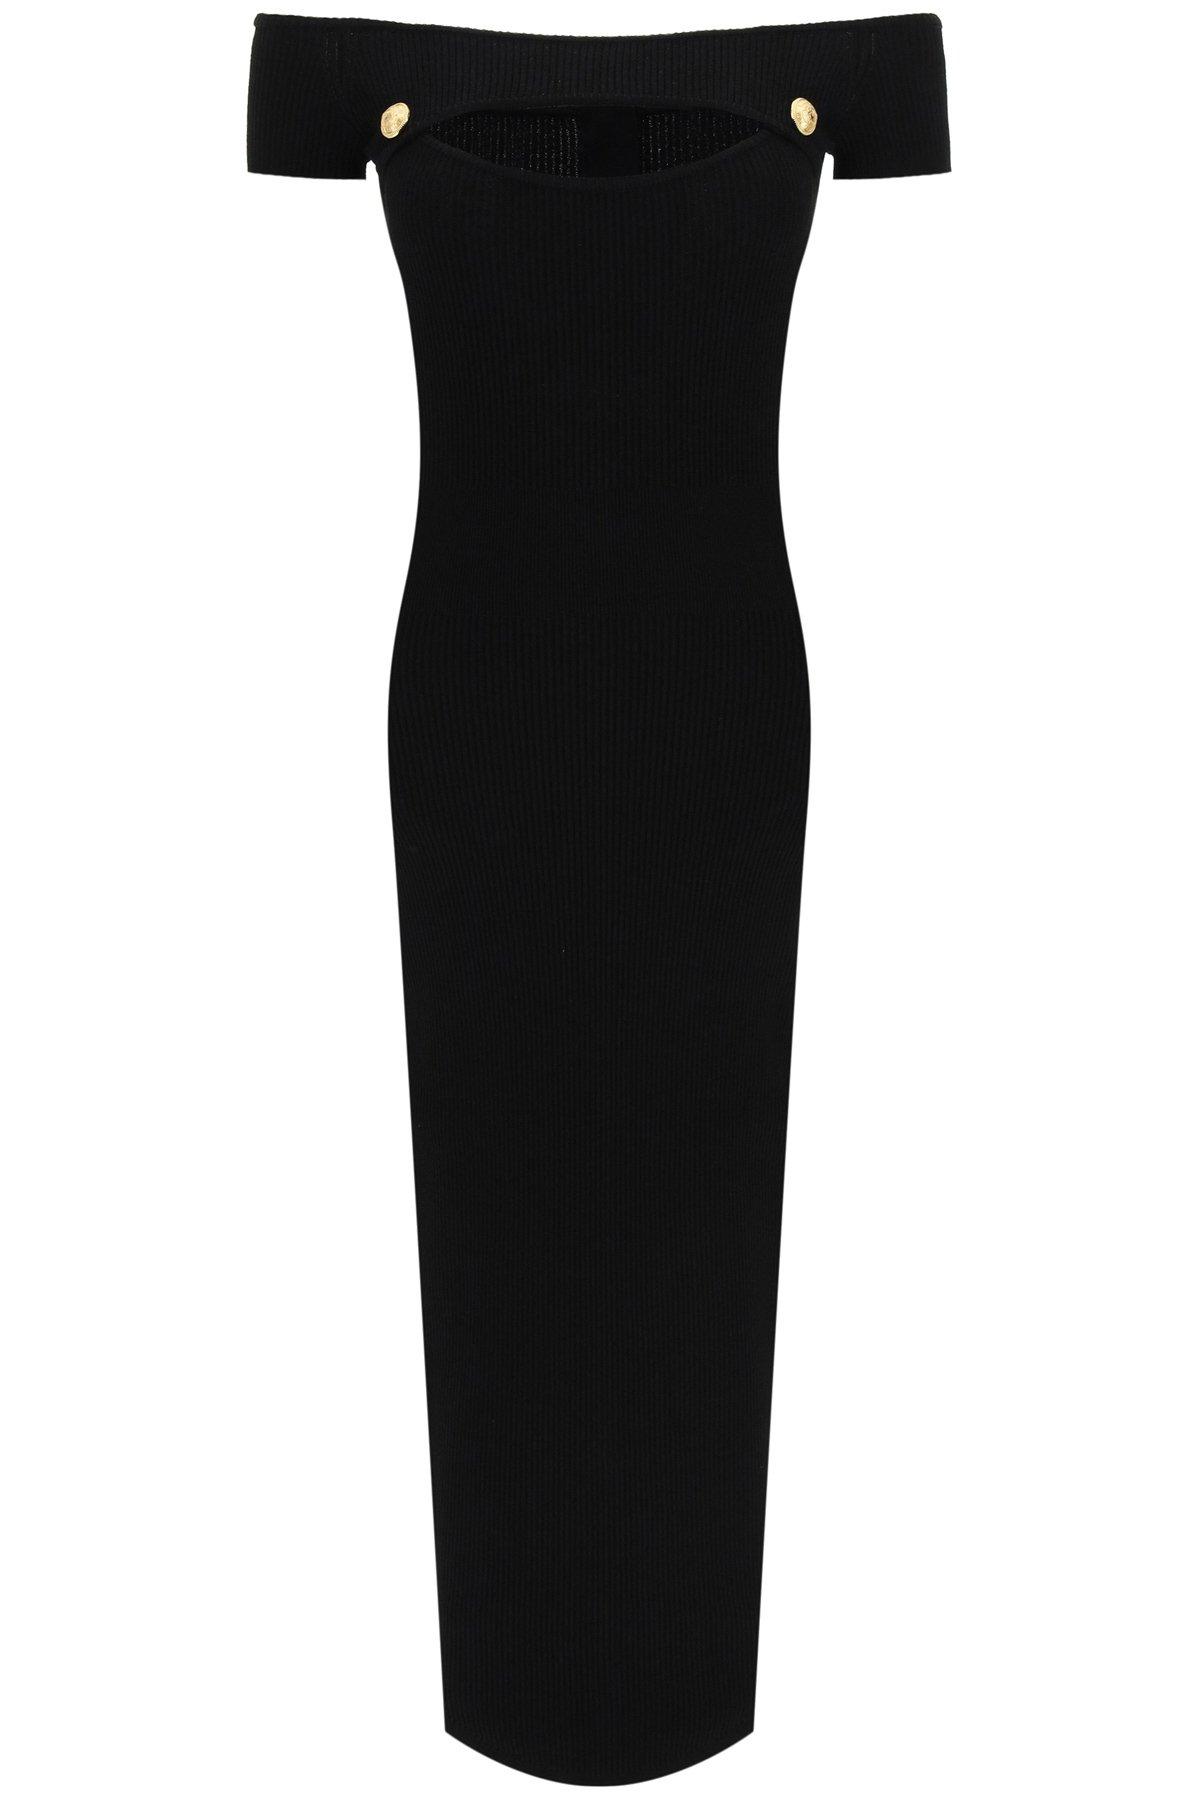 Balmain abito a costine off-shoulder